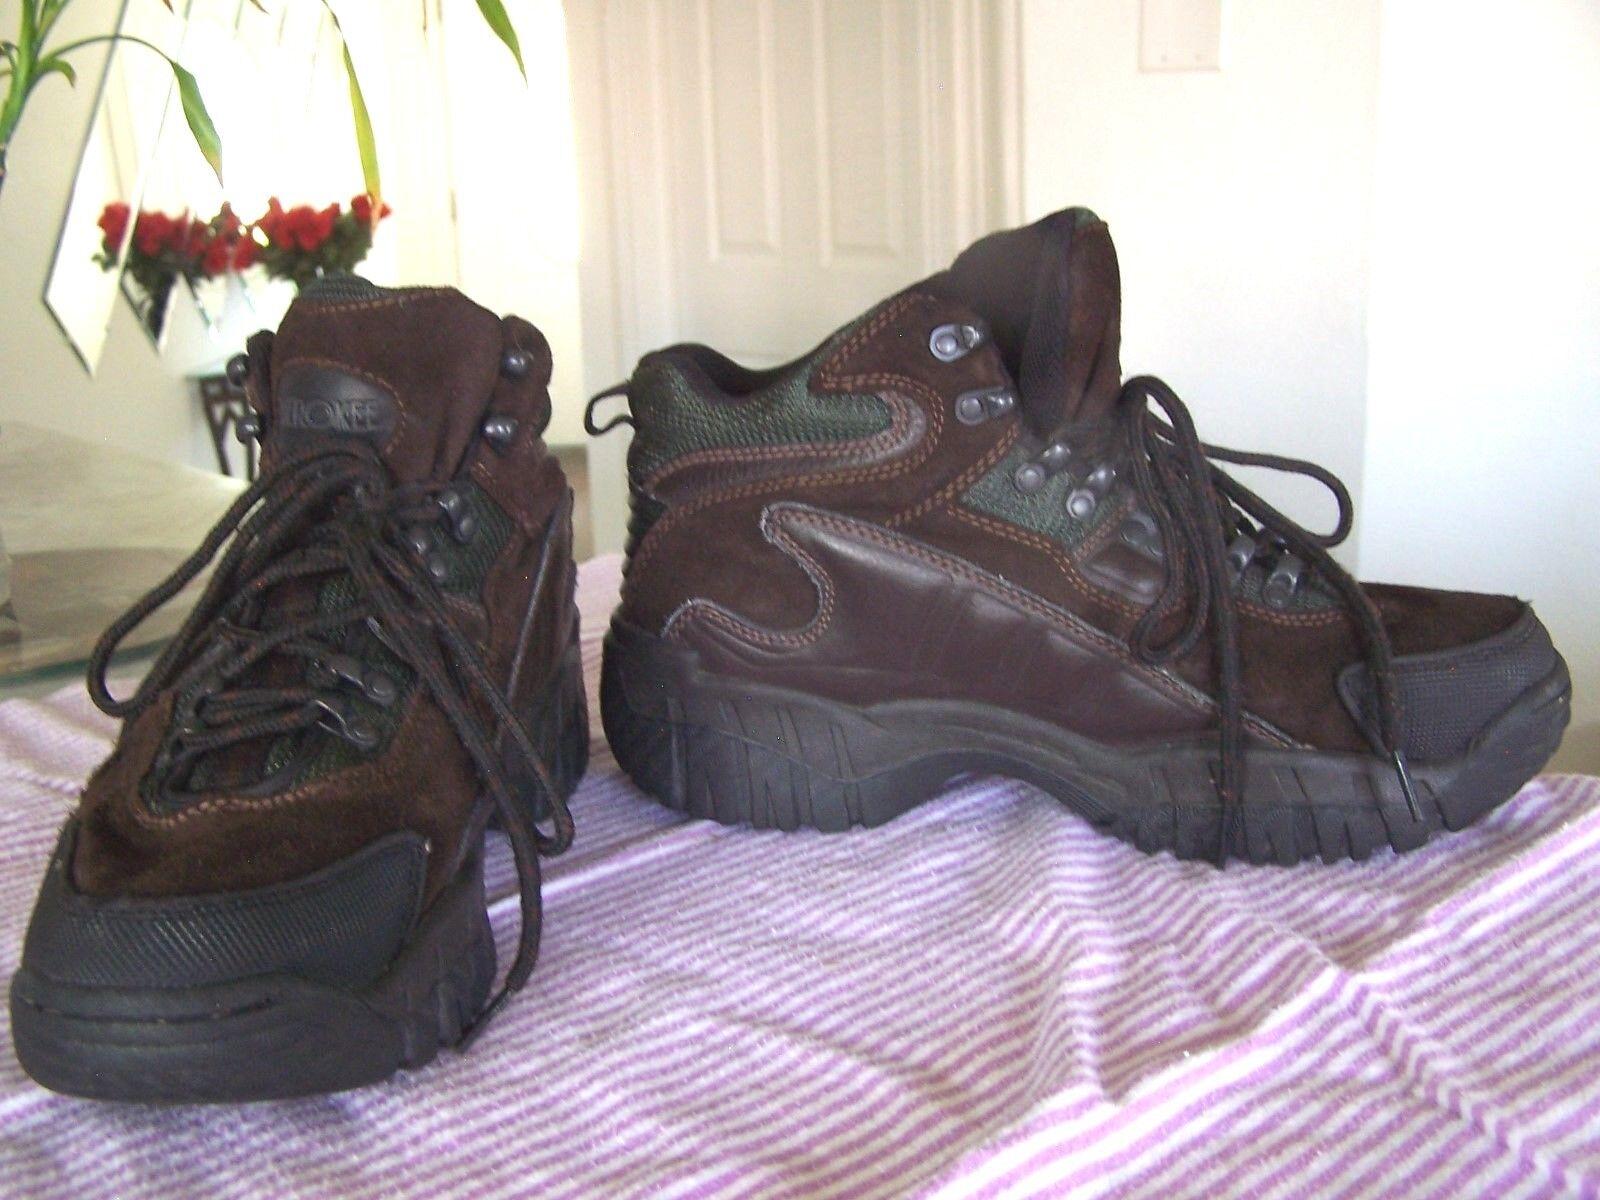 CHEROKEE Uomo Hiking Or Or Hiking Work Stivali Size 9 3b820a